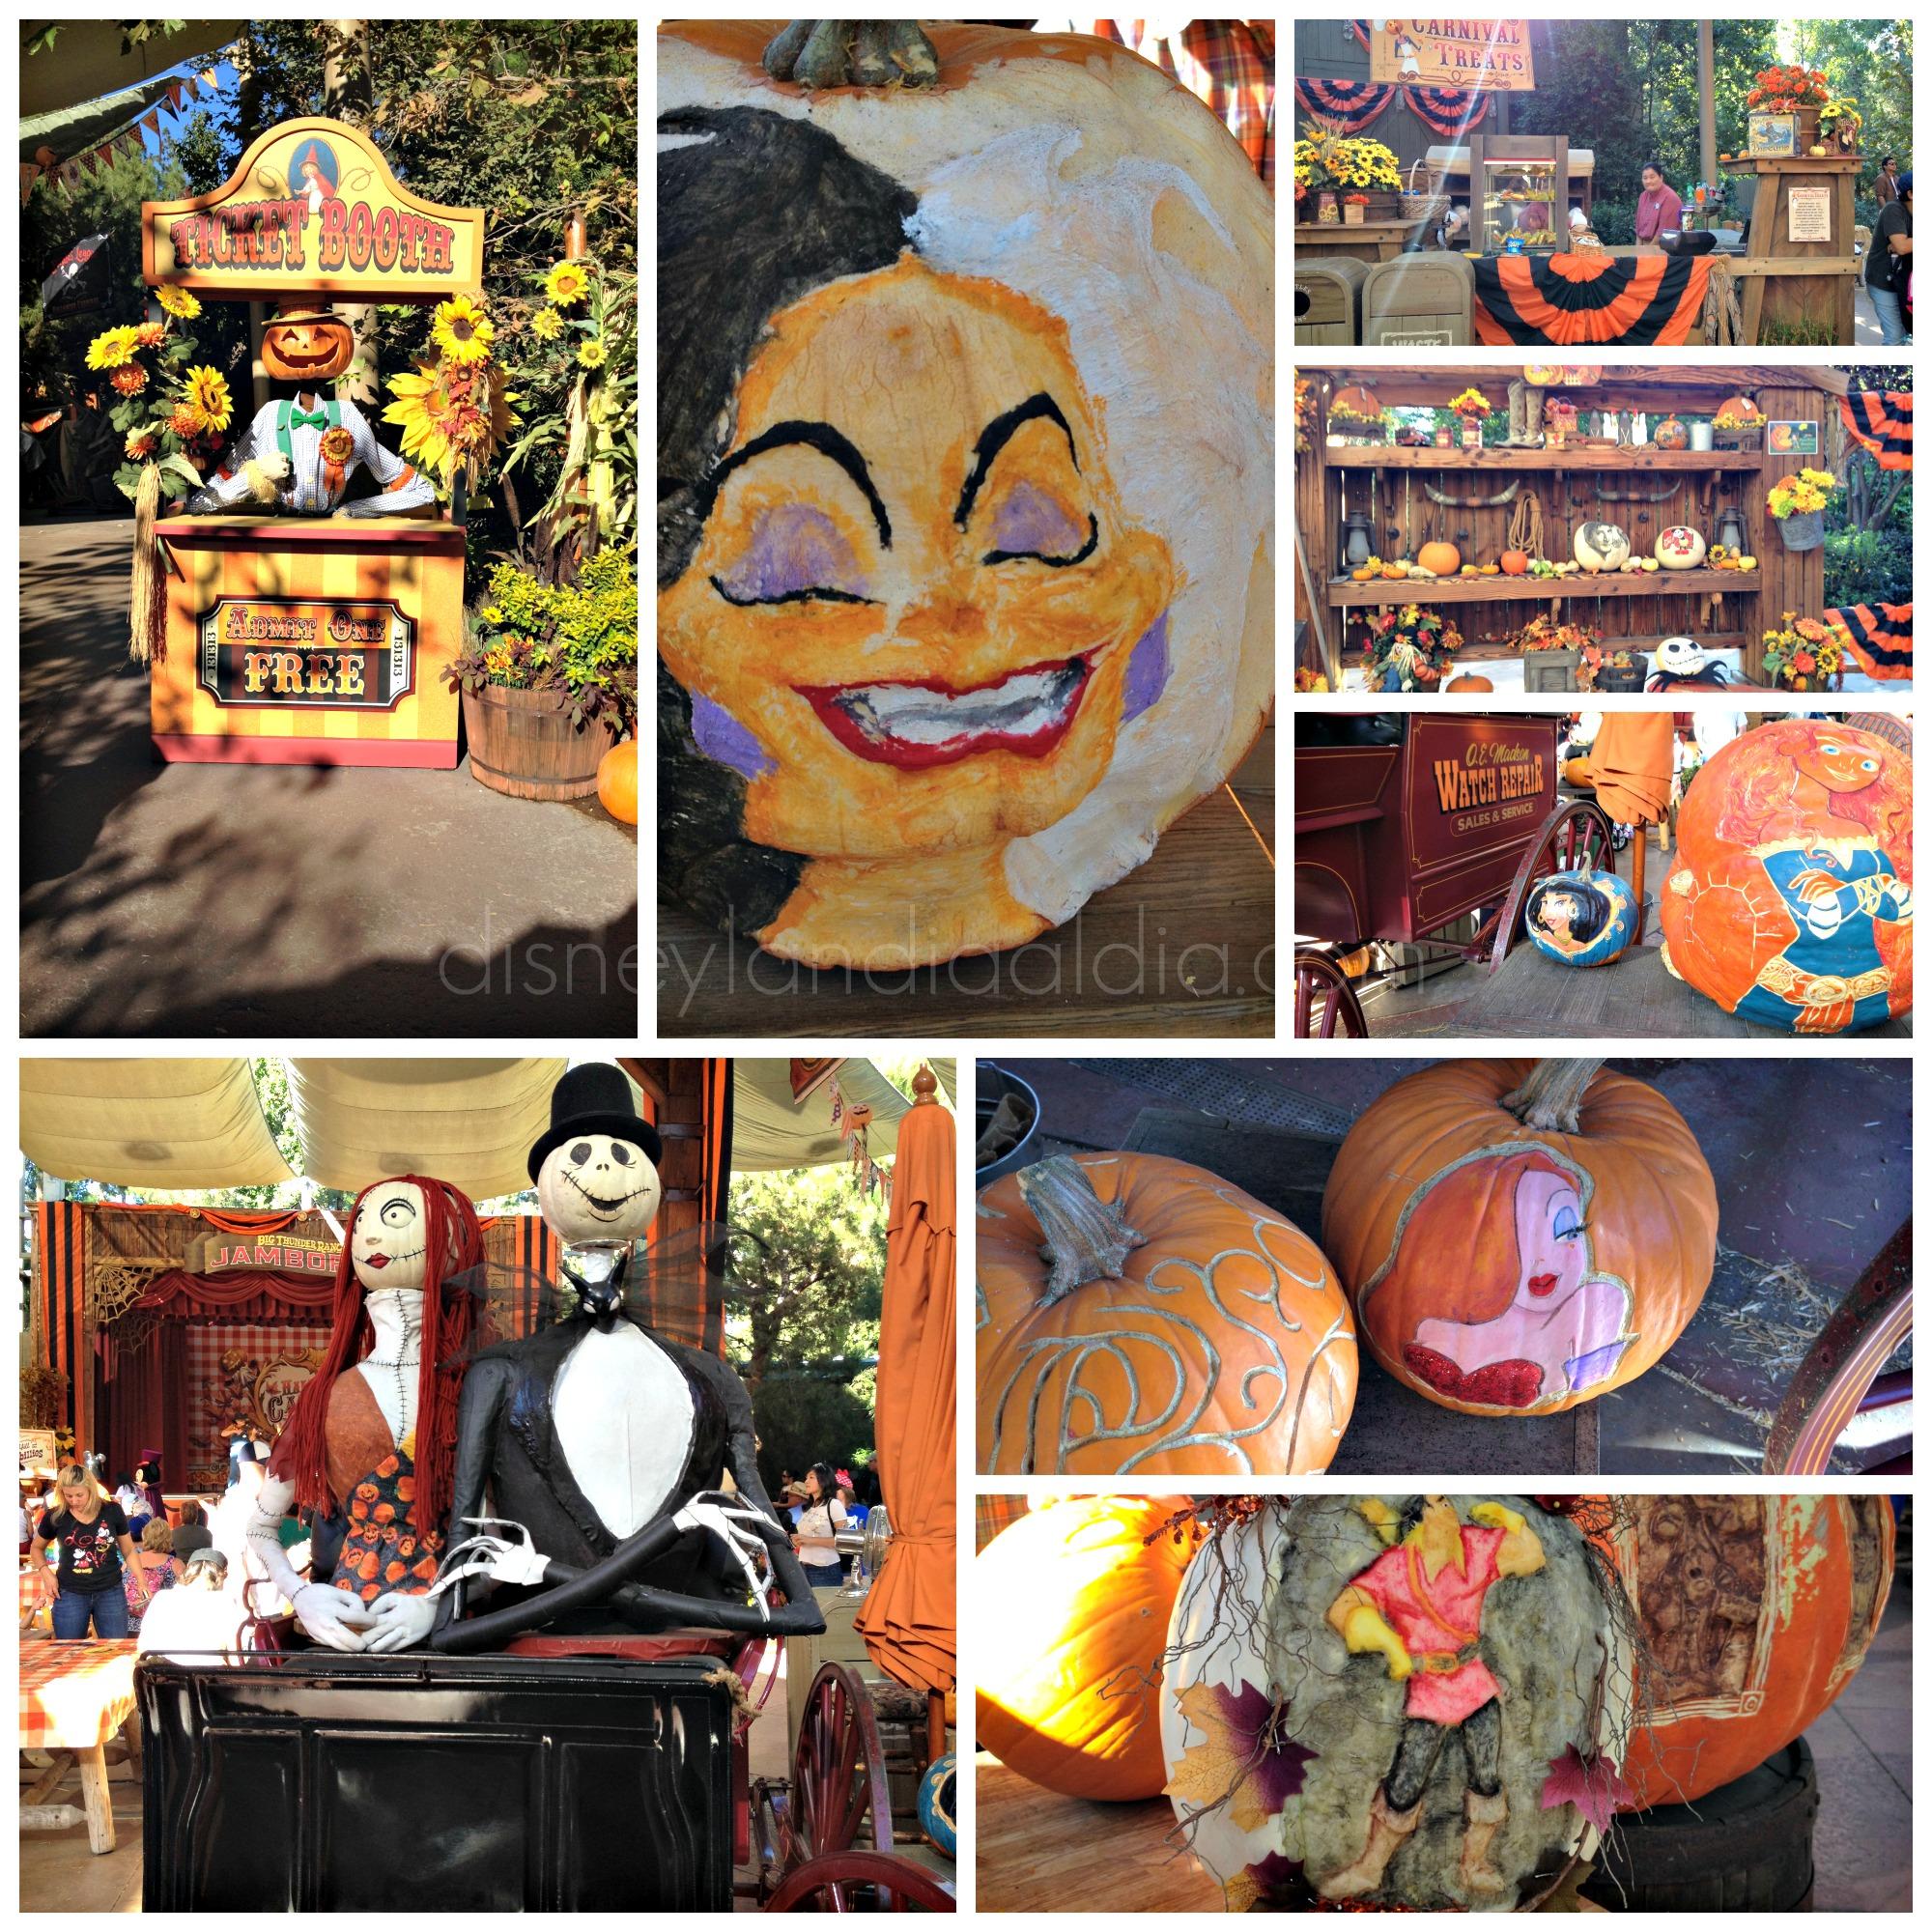 Halloween at Disneyland3